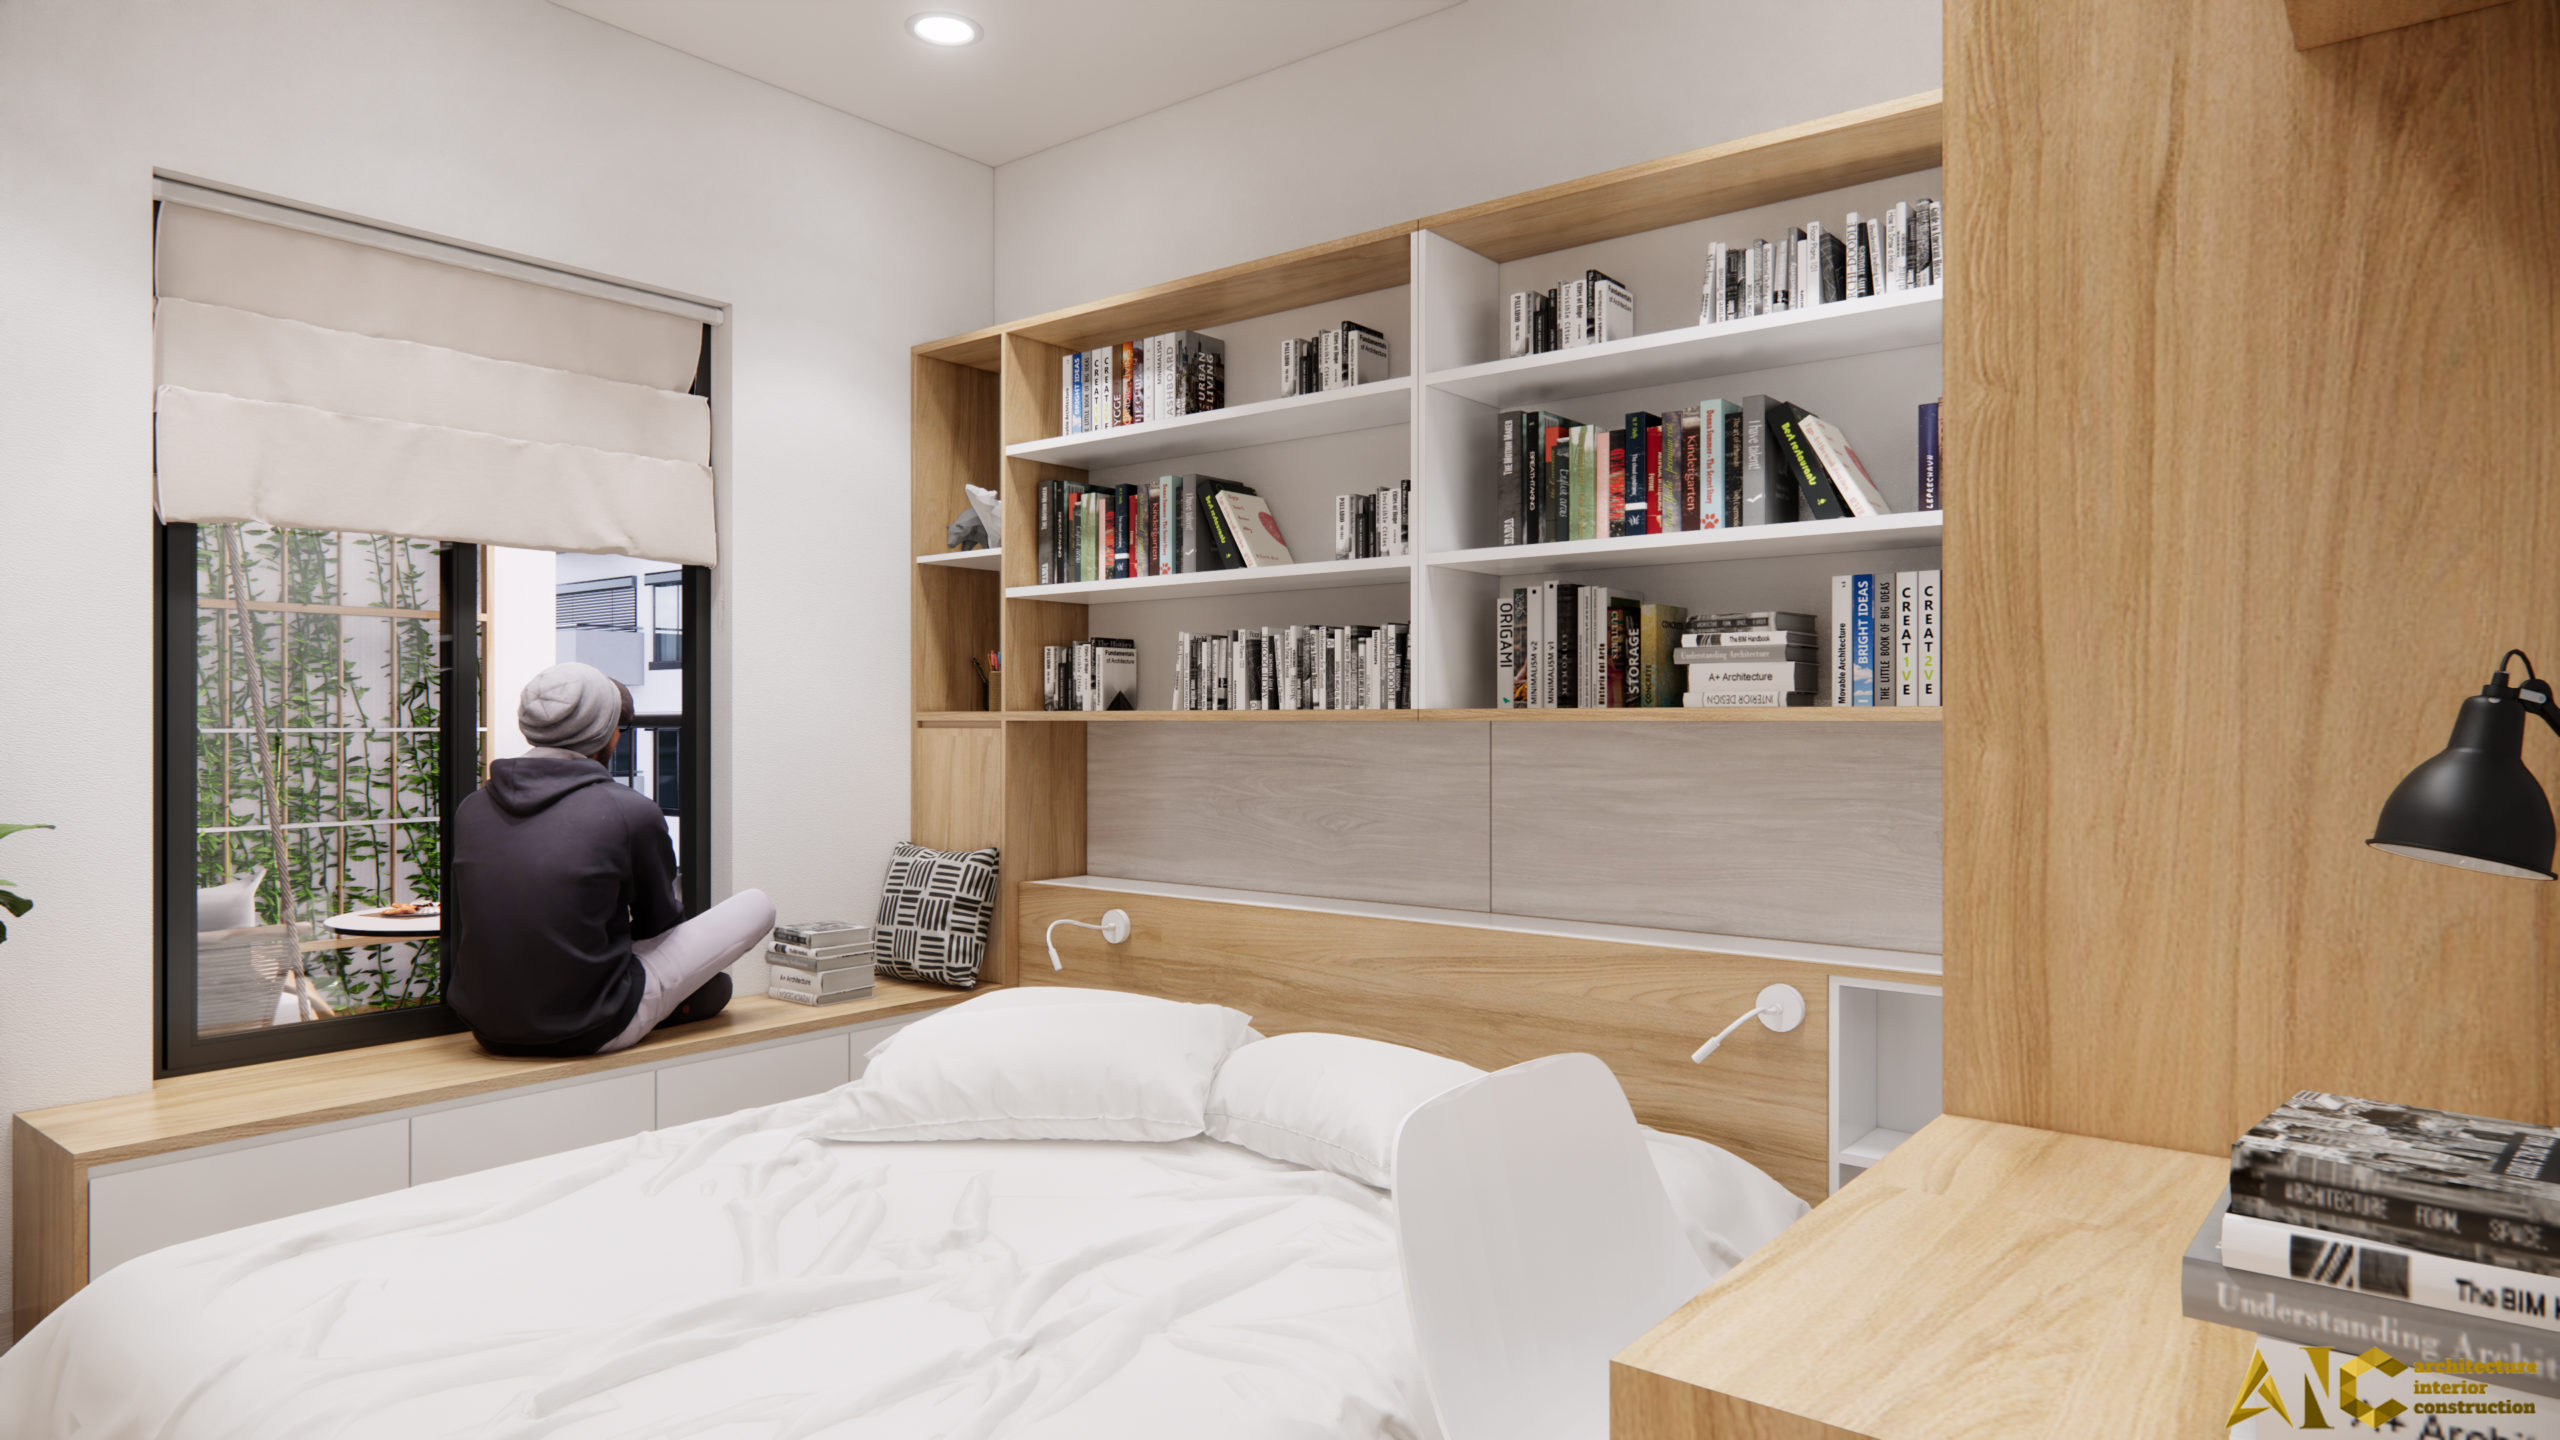 thiết kế căn hộ him lam (18)